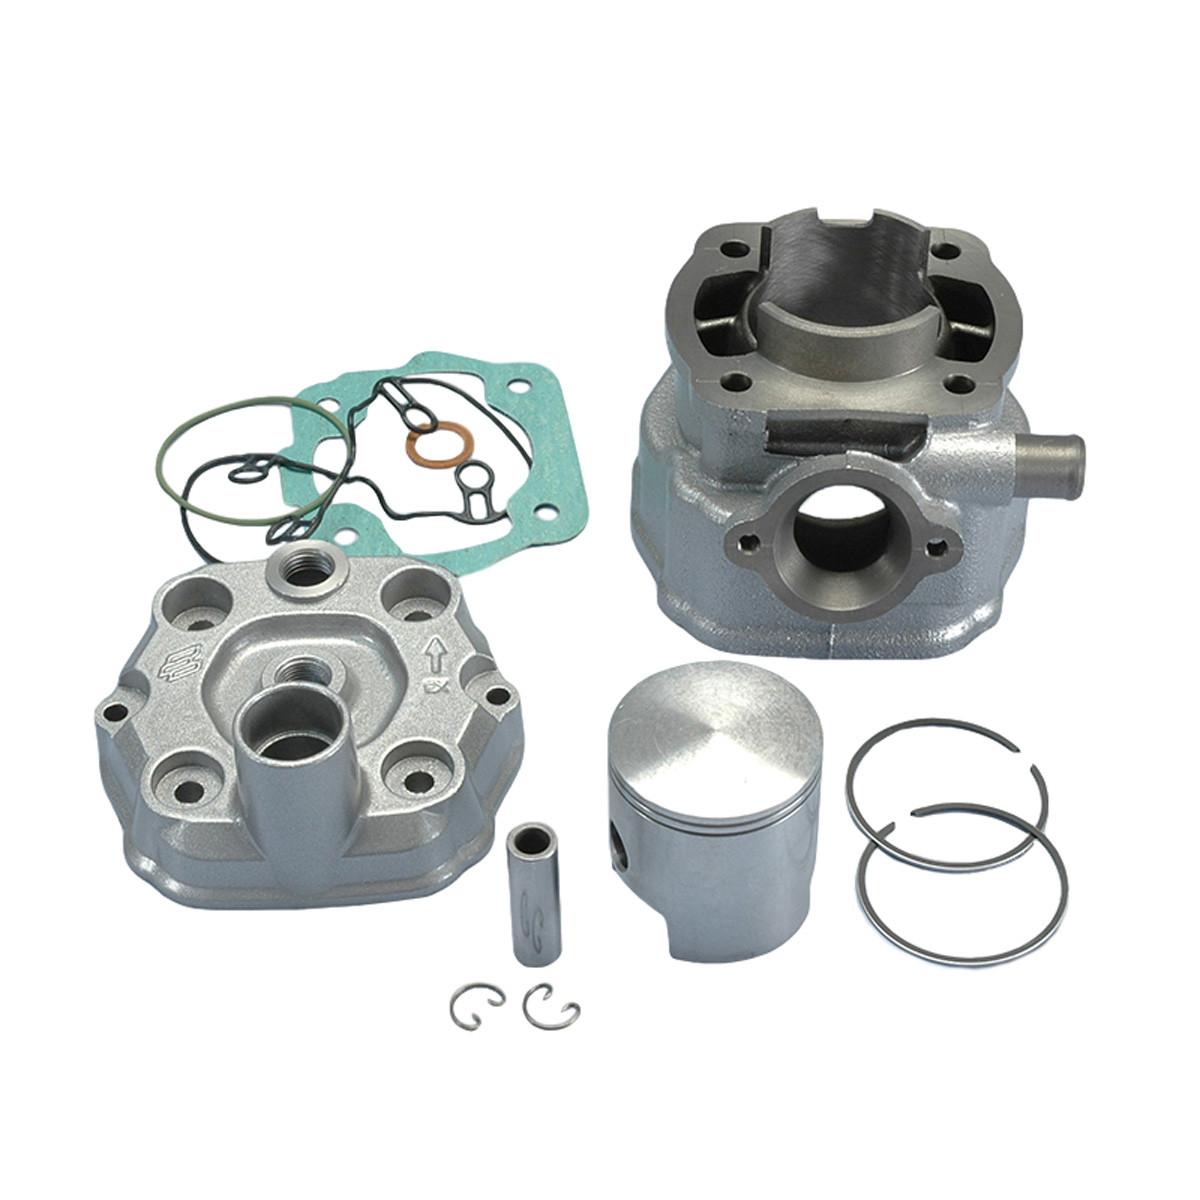 Haut moteur DERBI E2 80cc Fonte - POLINI